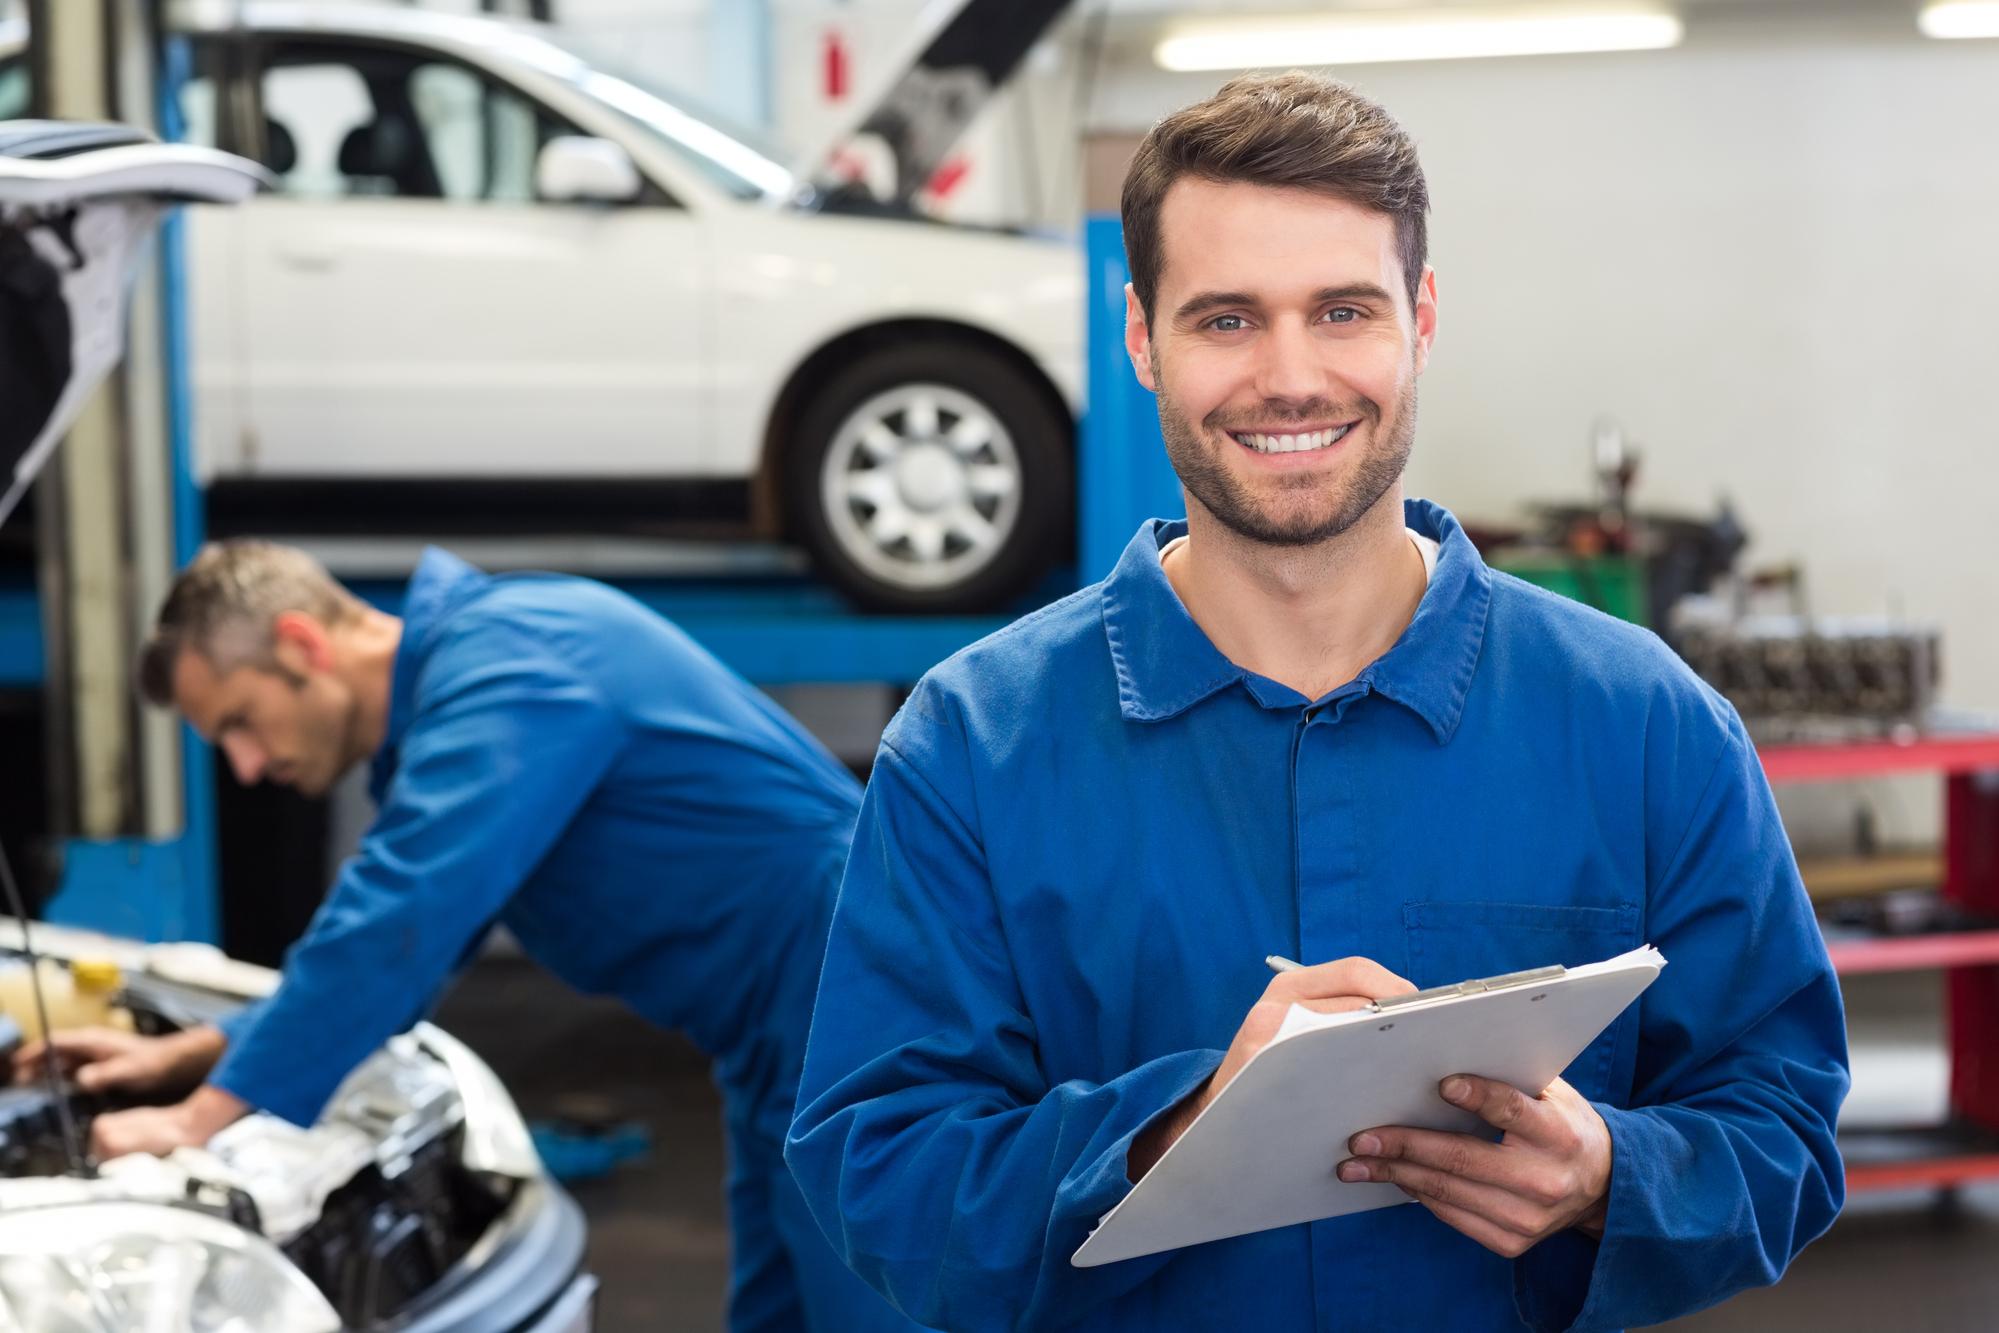 Mechanic Workshop Business For Sale